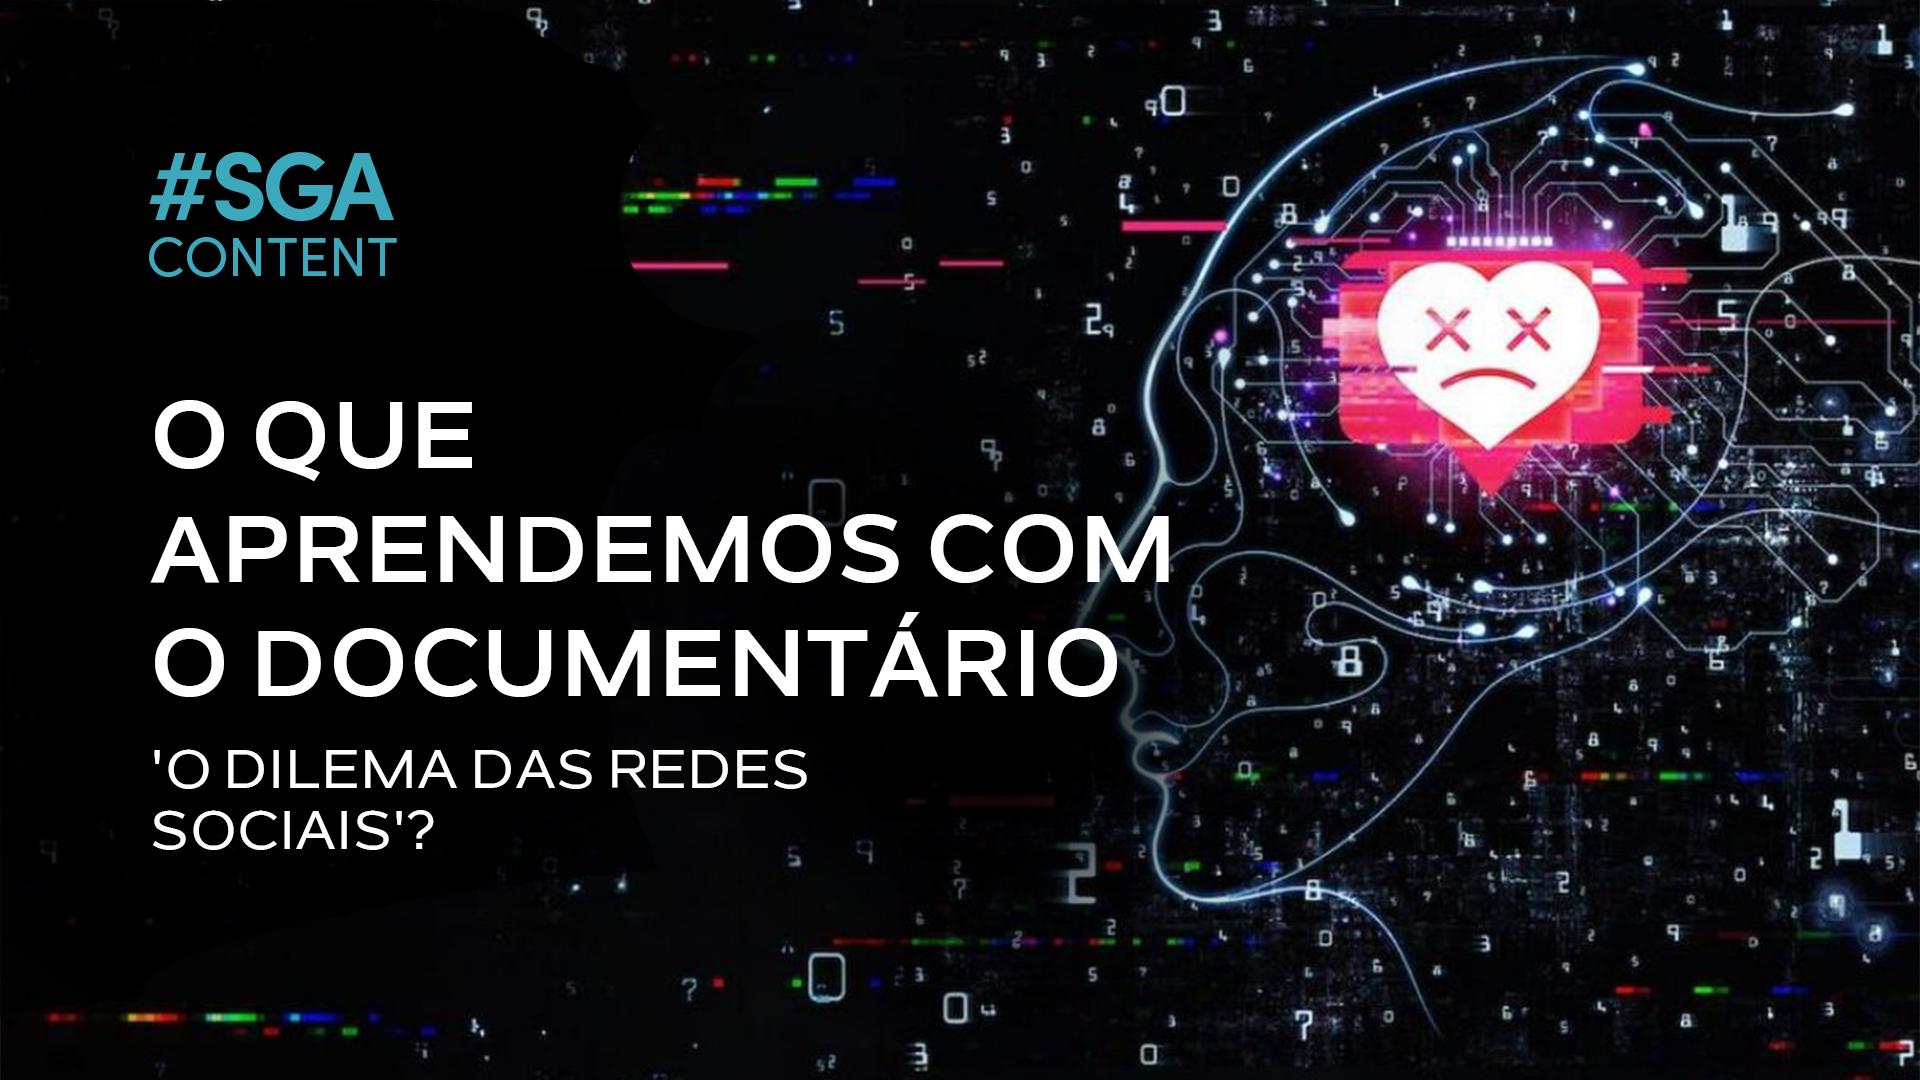 SGAContent_O-dilema-das-redes-sociais_blog